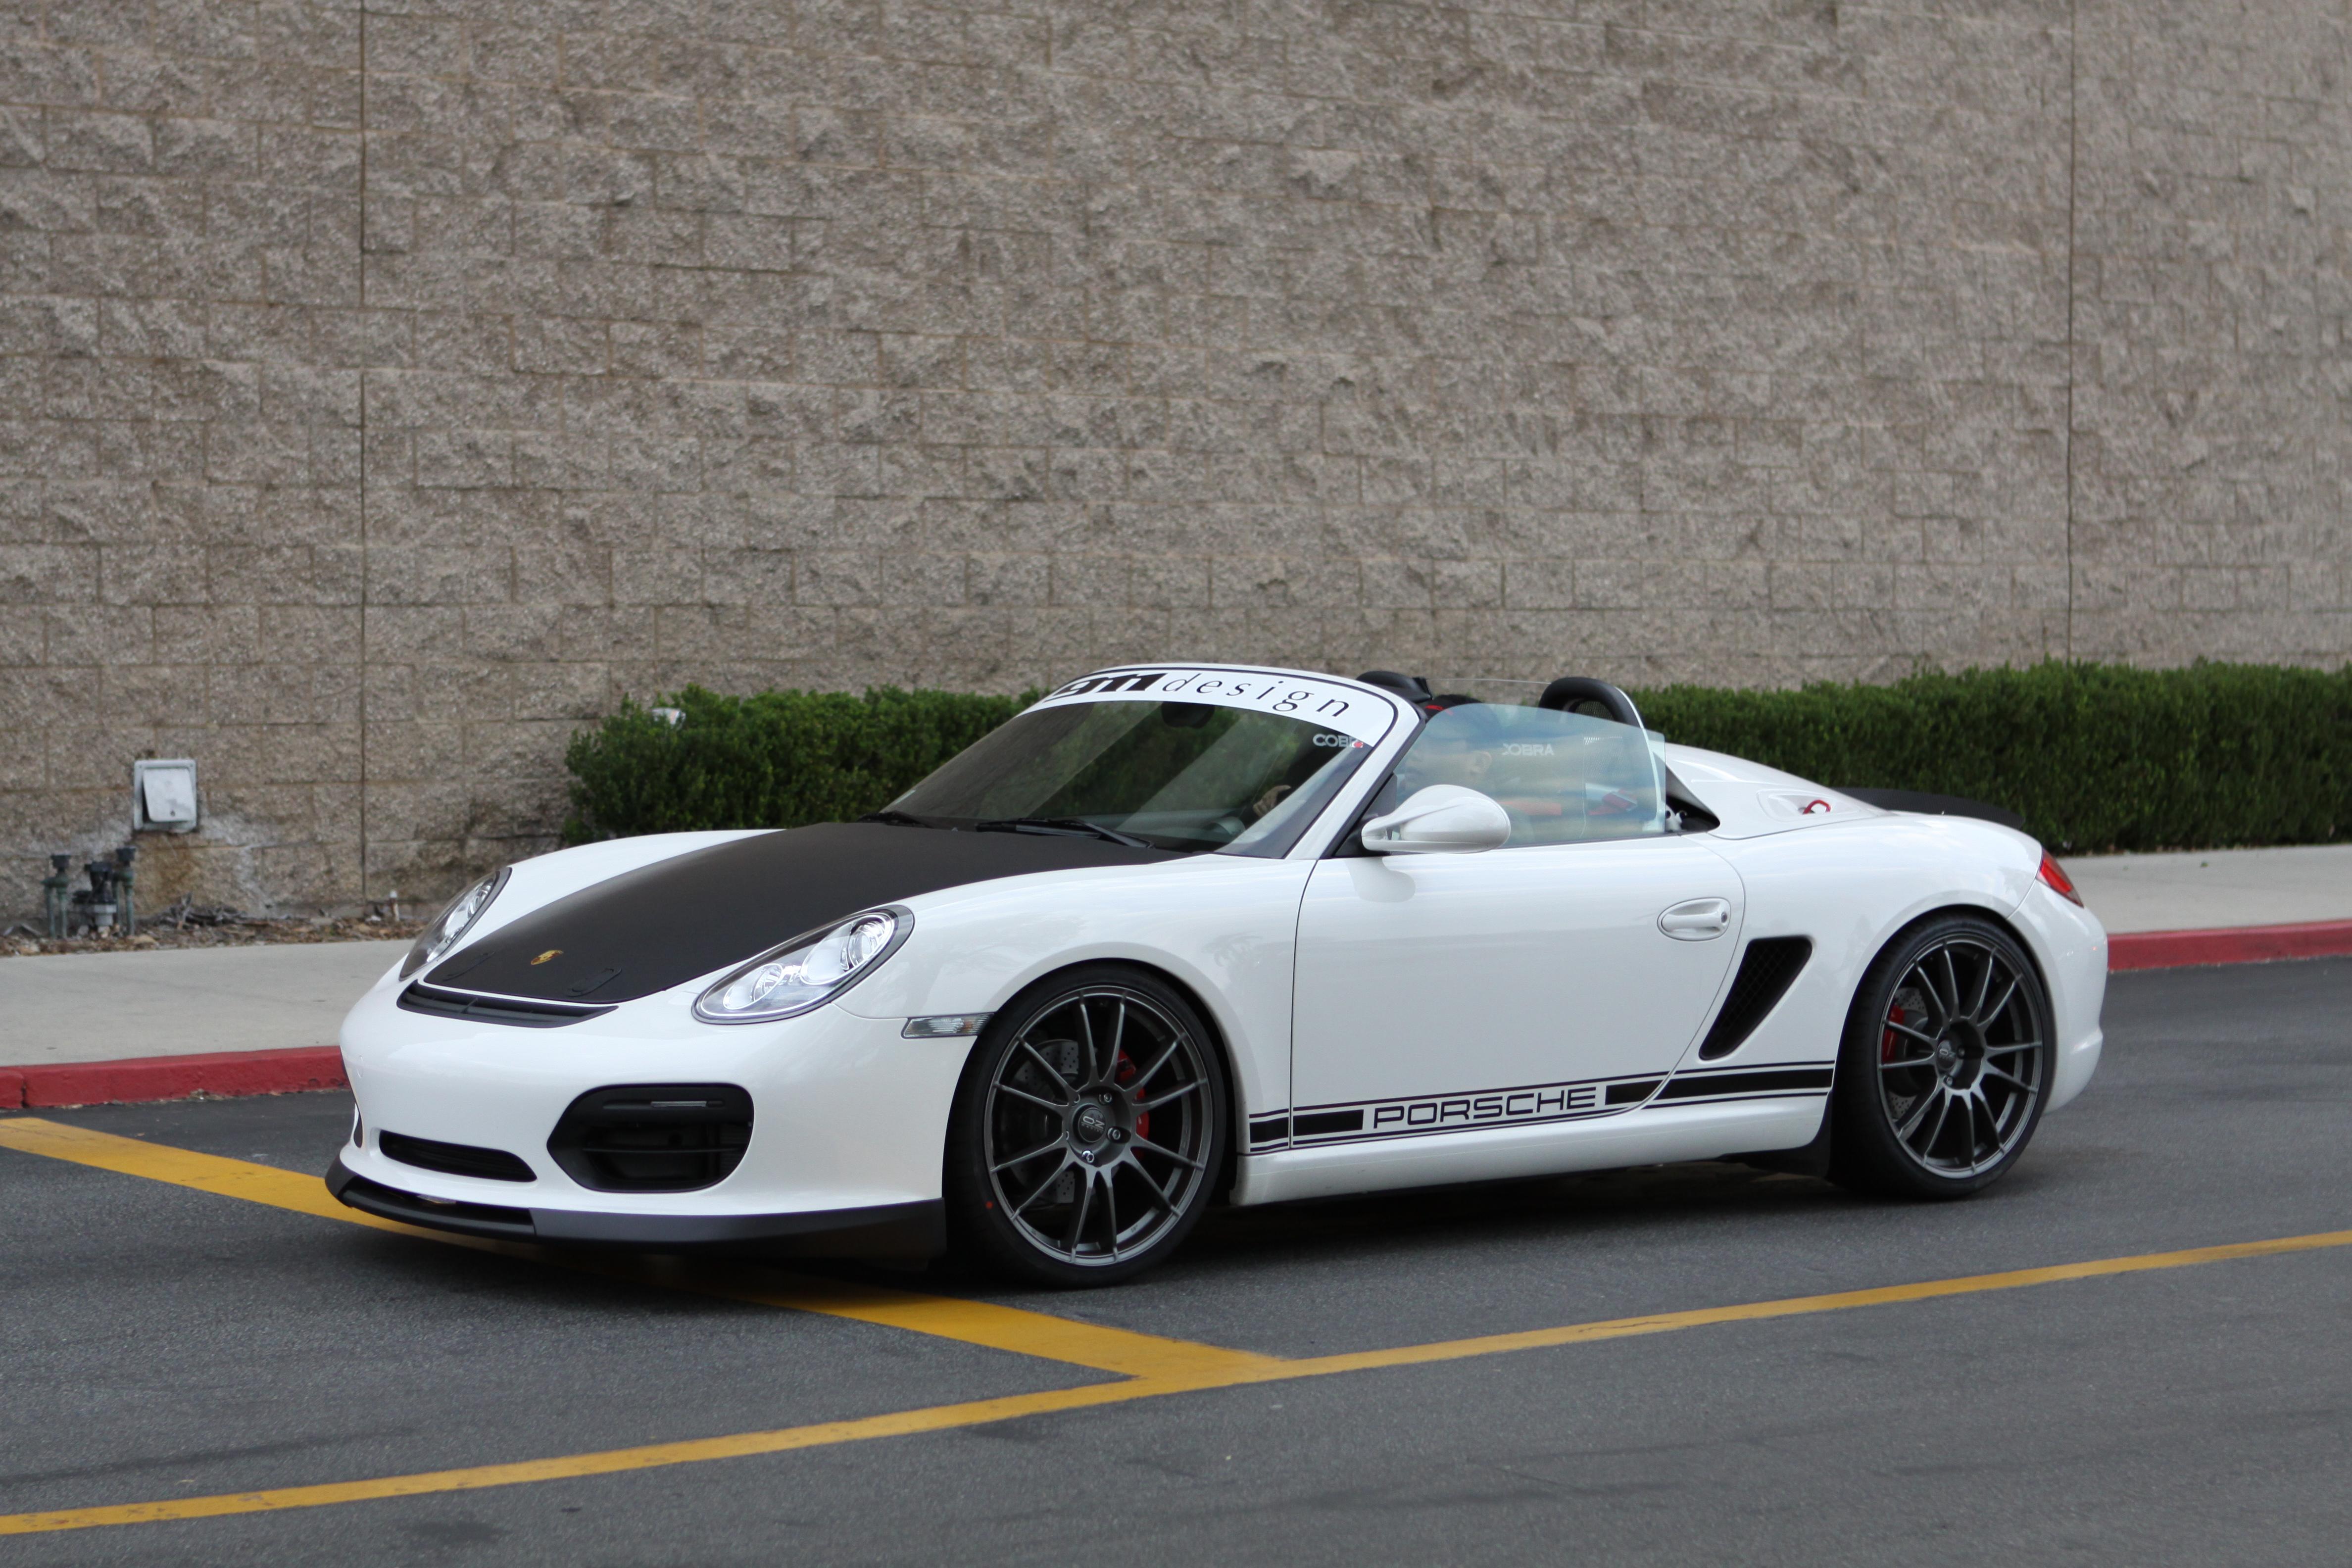 Porsche boxster spyder cars pinterest boxster spyder porsche boxster and wheels